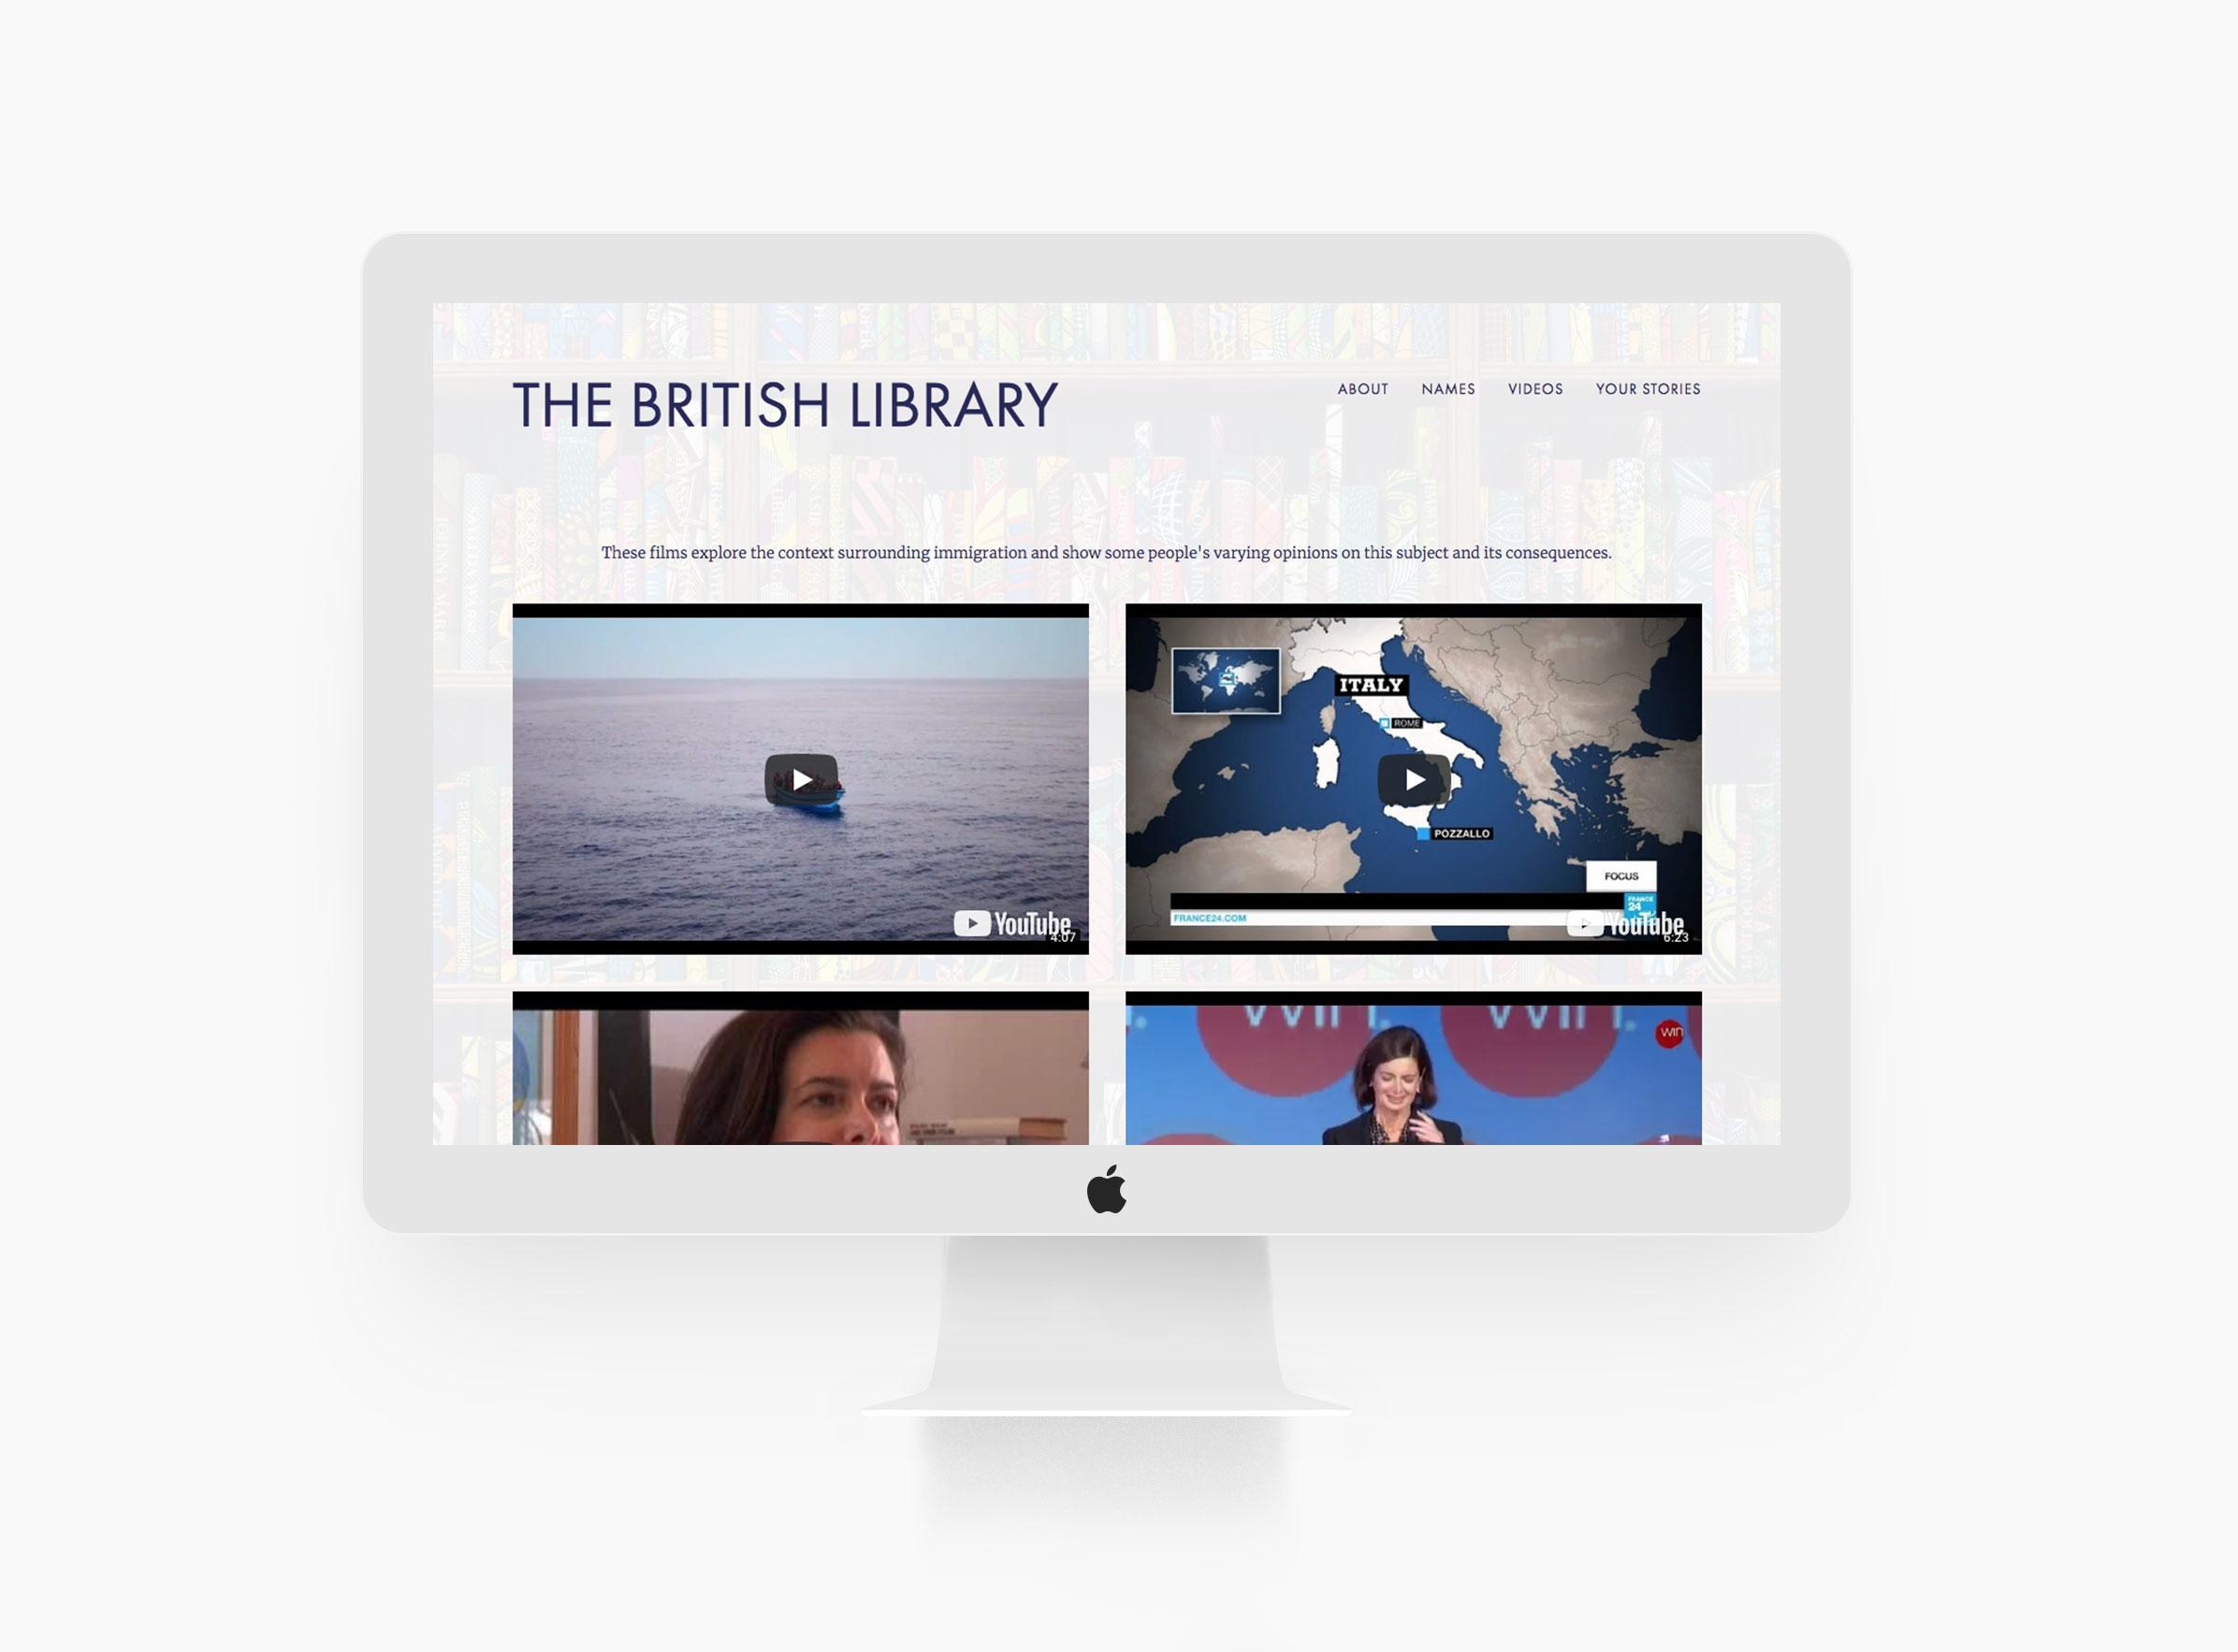 Web-Design-for-Artists-and-Creatives_Yinka-Shonibare-British-Library-videos.jpg